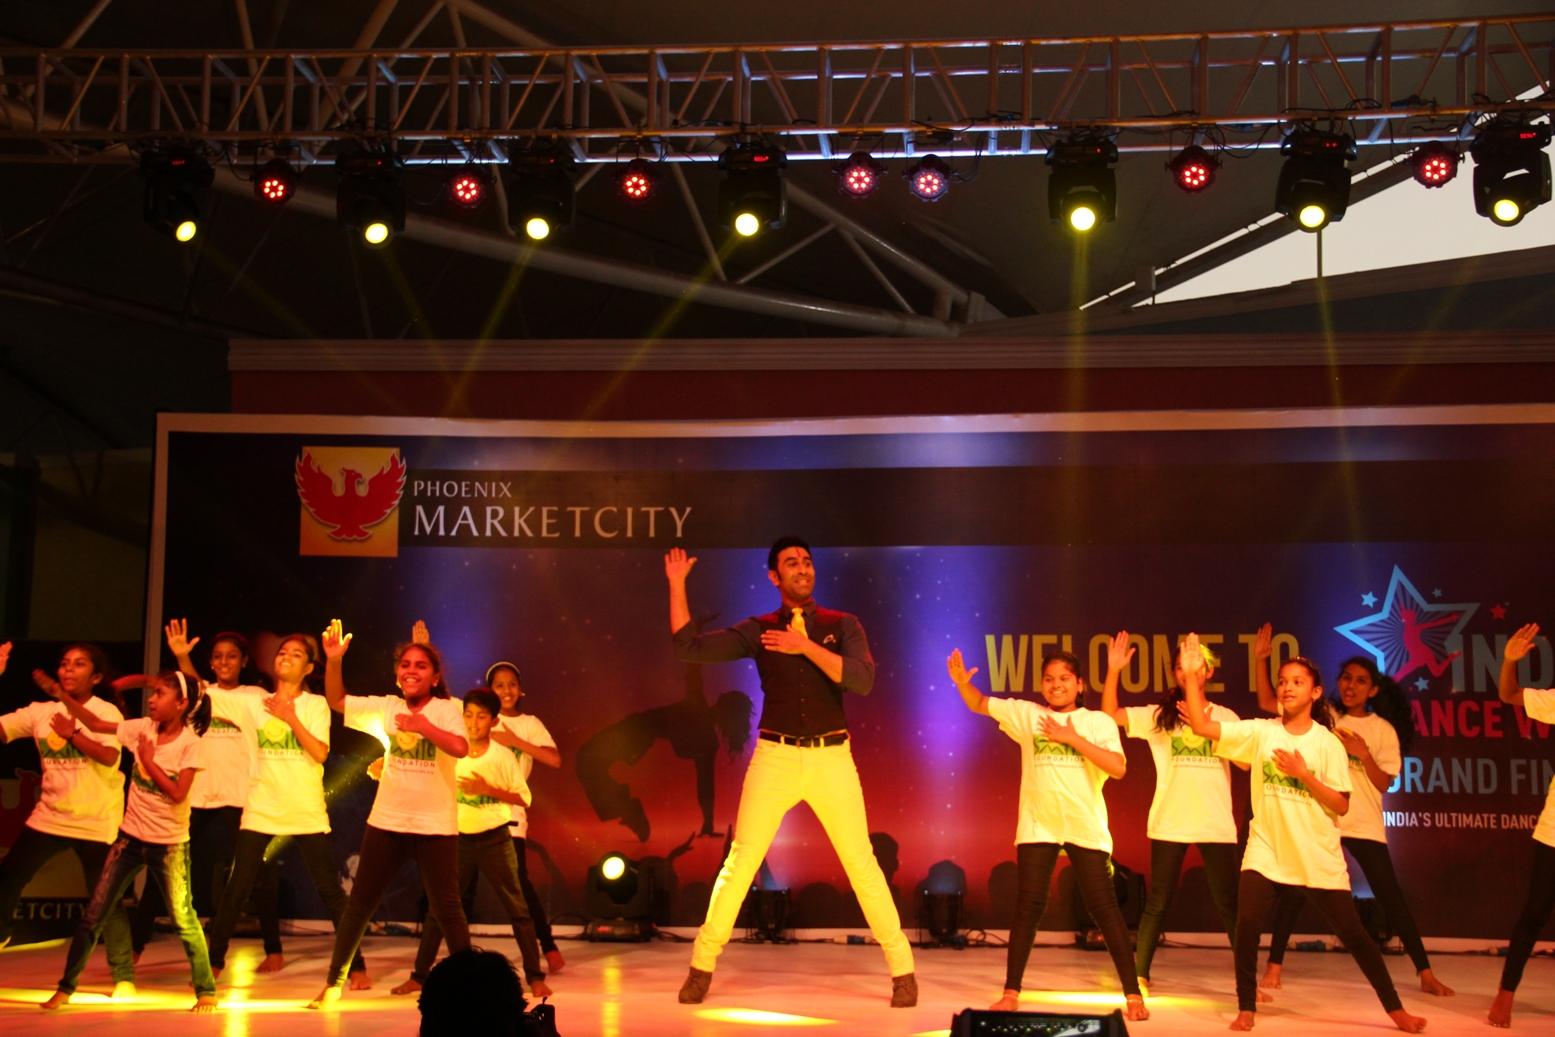 Sandip Soparrkar performs with Smile Foundation kids at Phoenix Marketcity Kurla